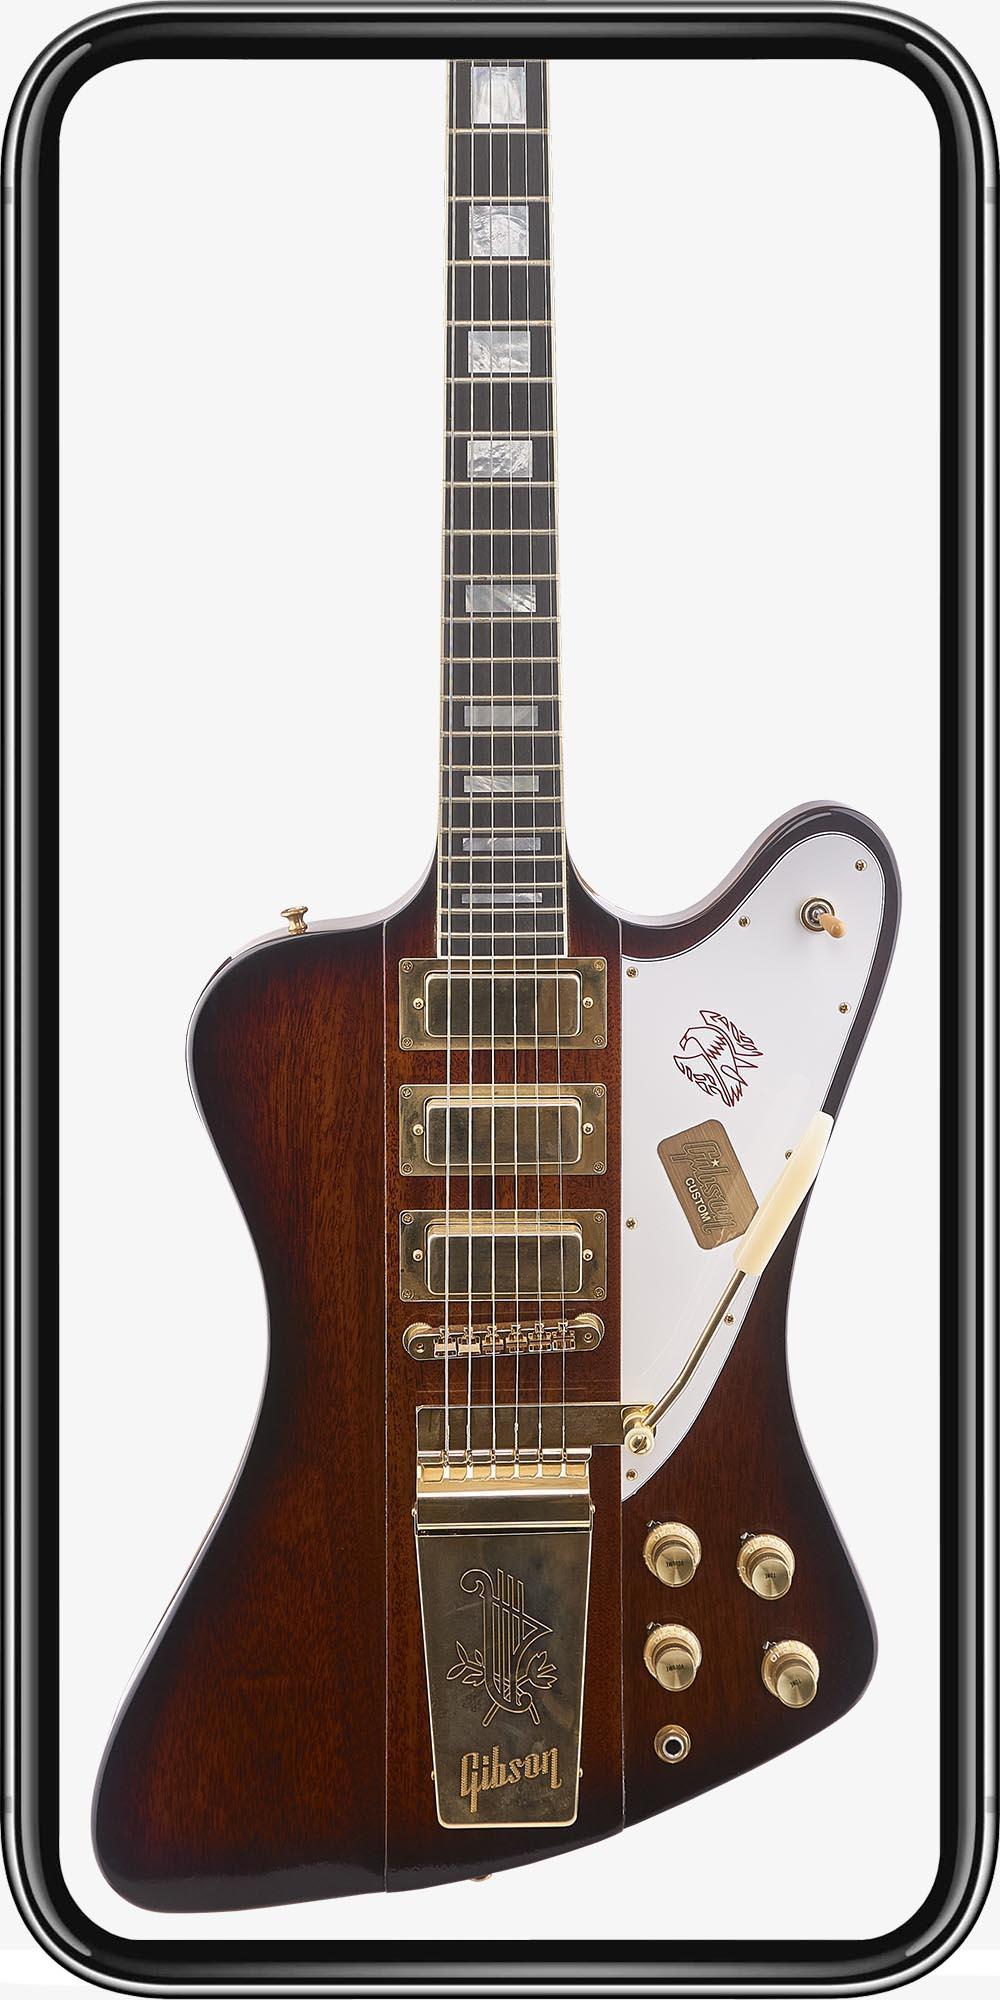 Gibson Custom Firebird VII '65 VOS Vintage Sunburst